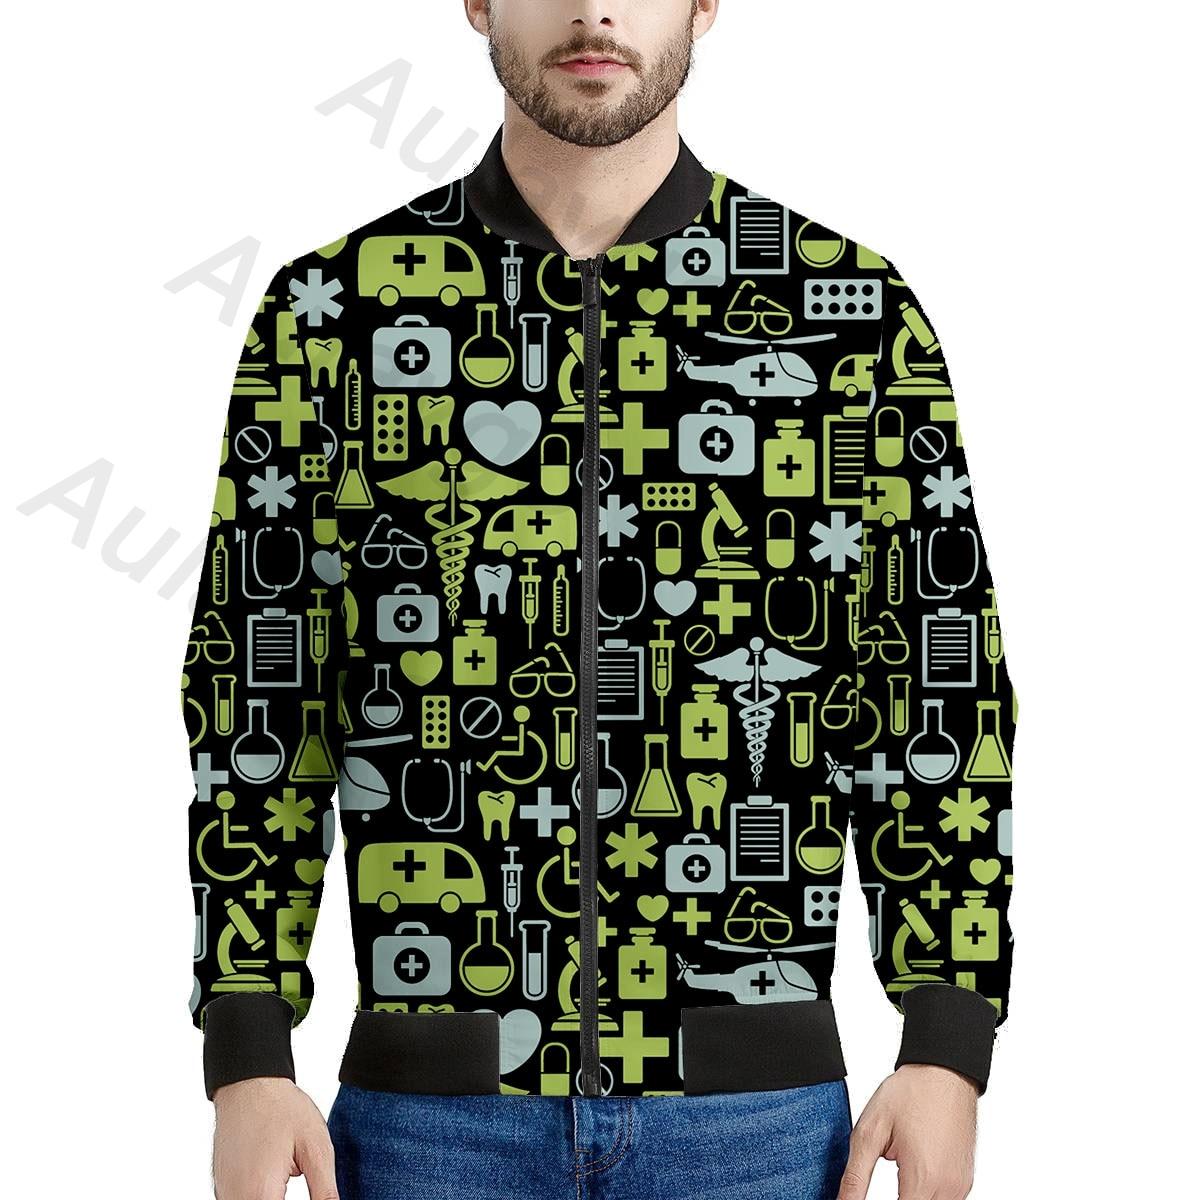 Equipo de Hospital Aulaygo, chaqueta informal estampada para hombre, ropa de abrigo de otoño, cuello de calidad, chaqueta Bomber para hombre, abrigo para hombre, otoño